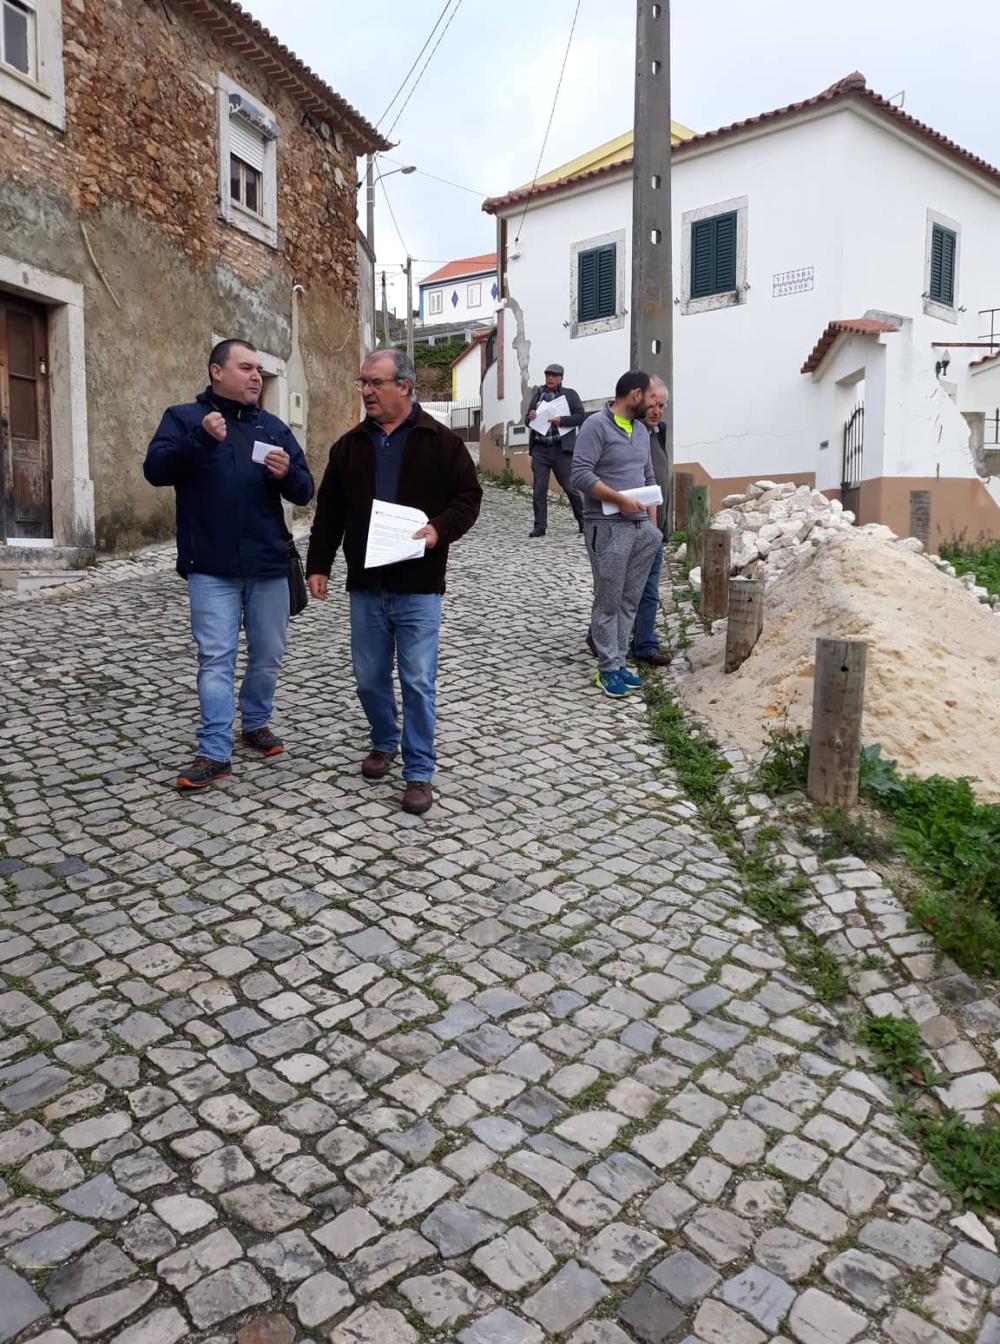 CDU arranca com campanha de contacto concelhia na antiga freguesia de Matacães